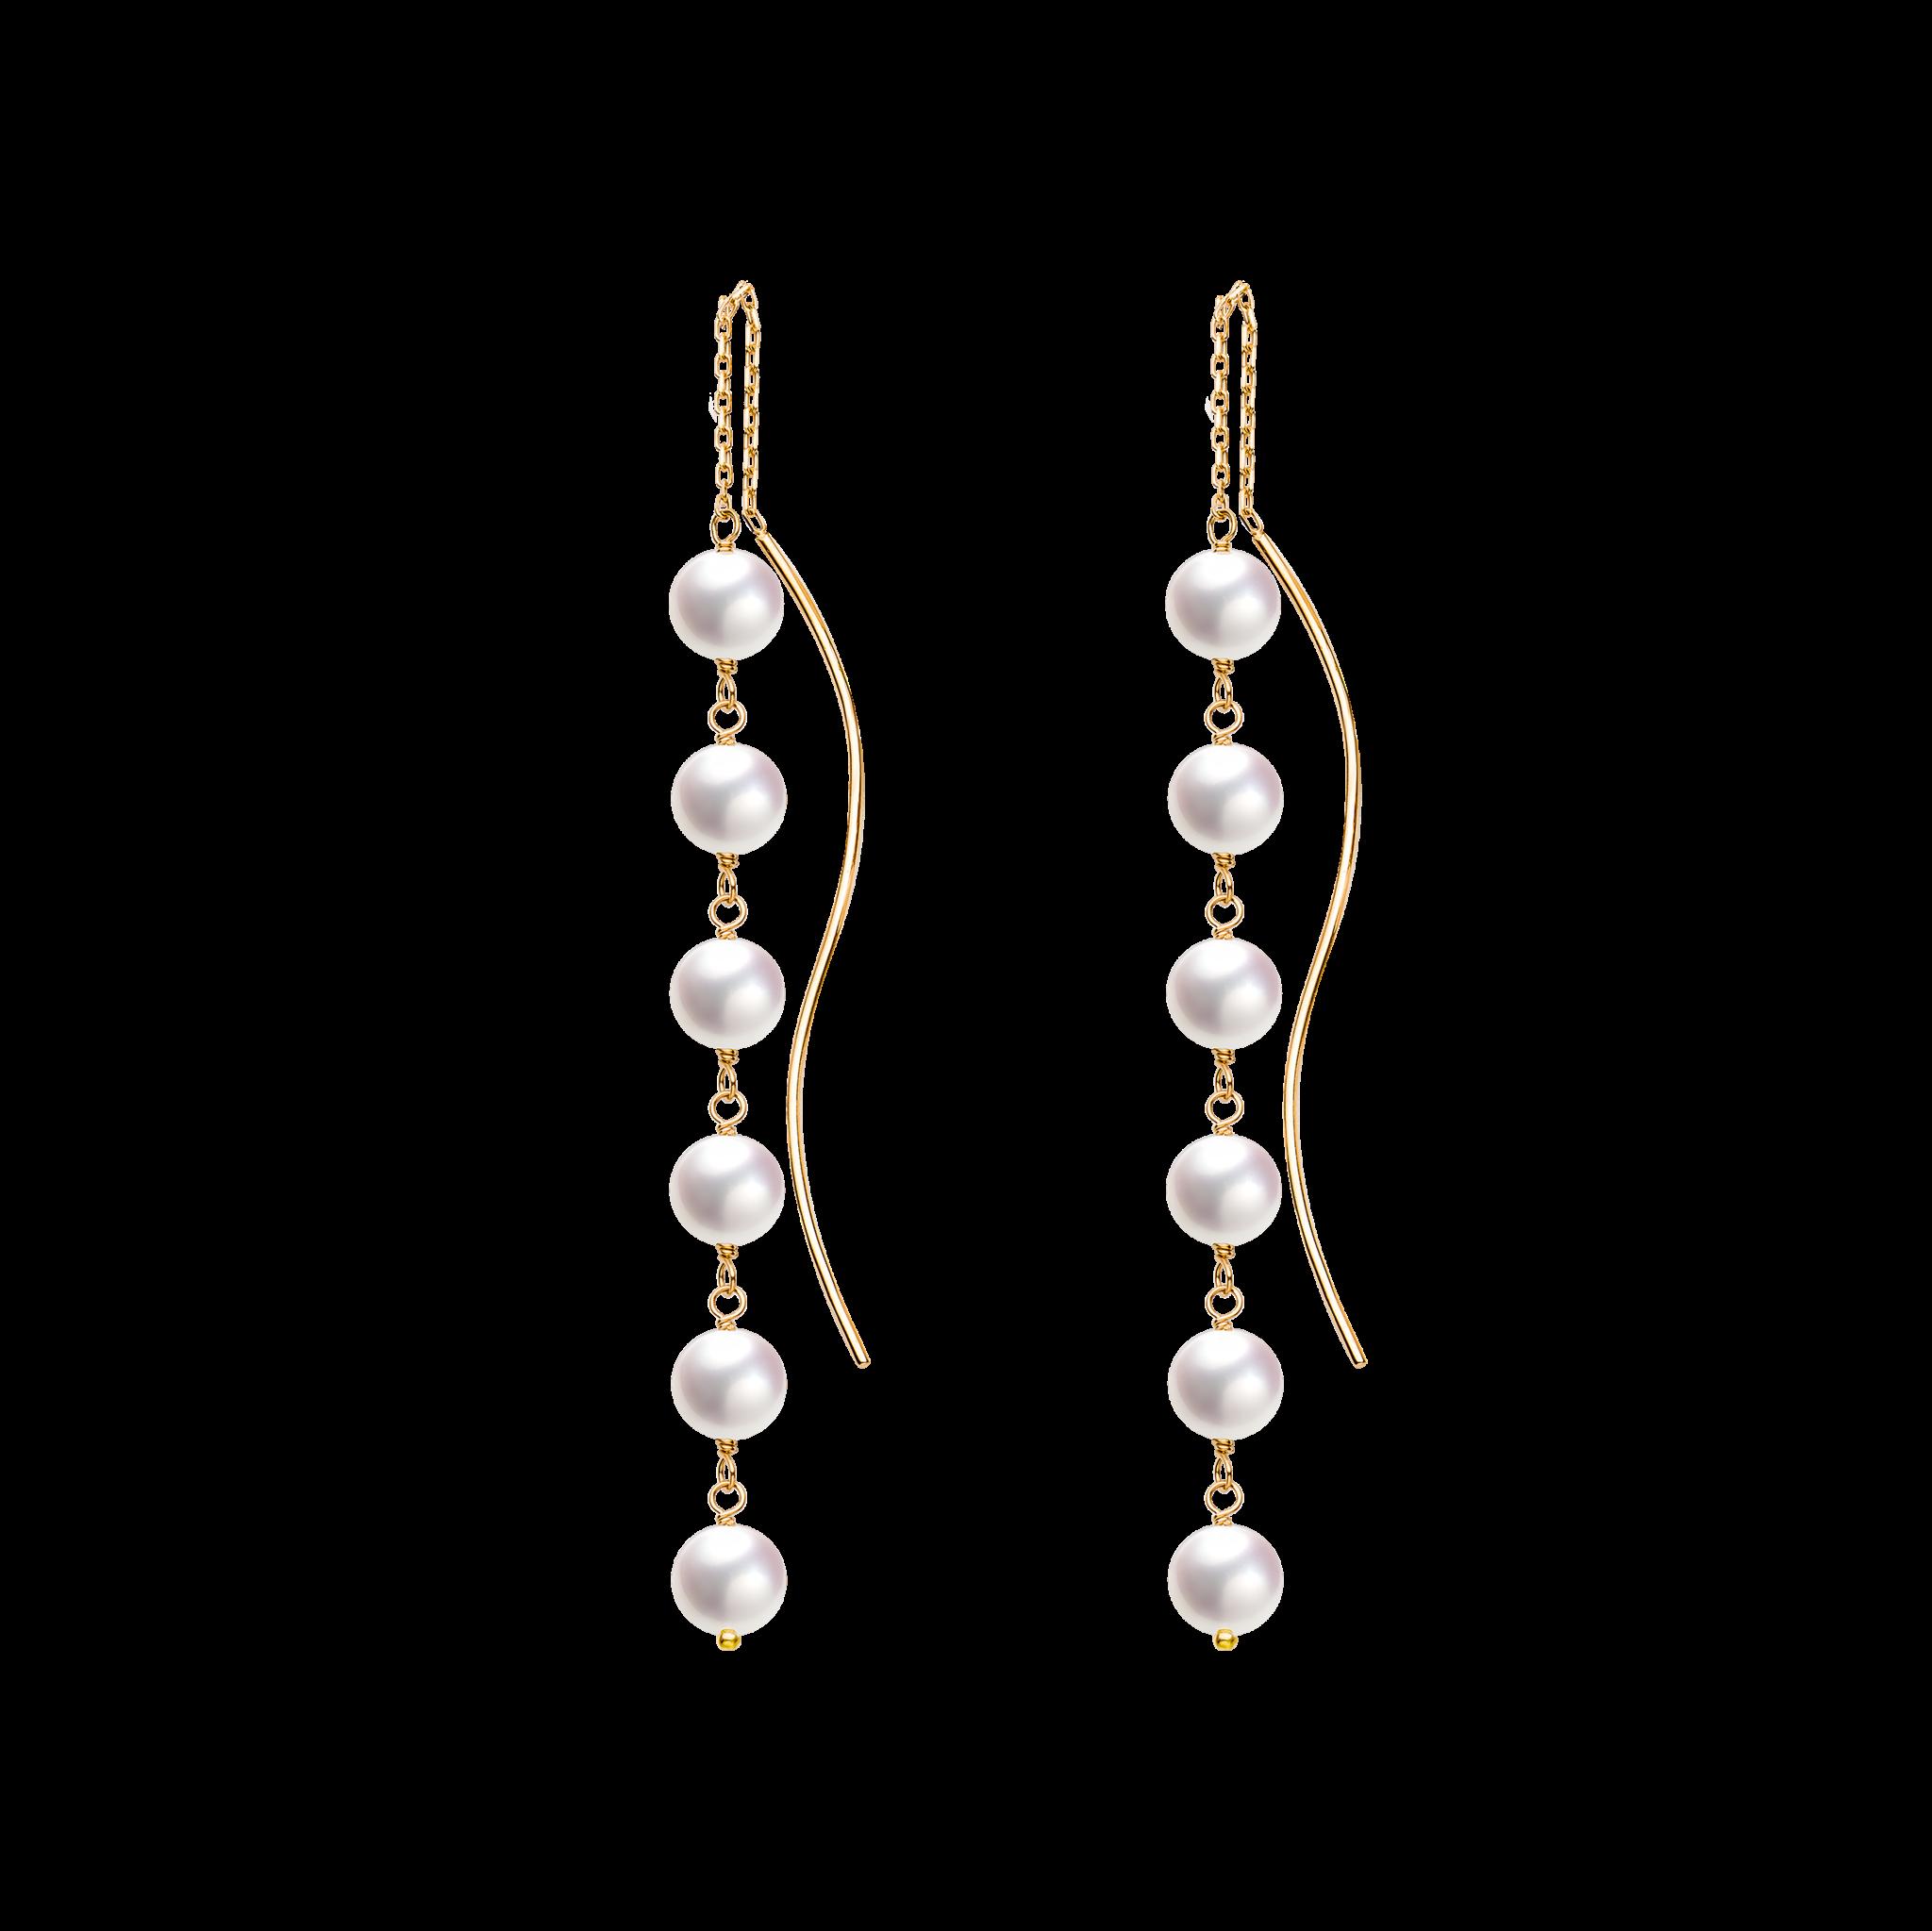 Spuma Collection 10K玫瑰金Akoya珍珠 耳线 2399